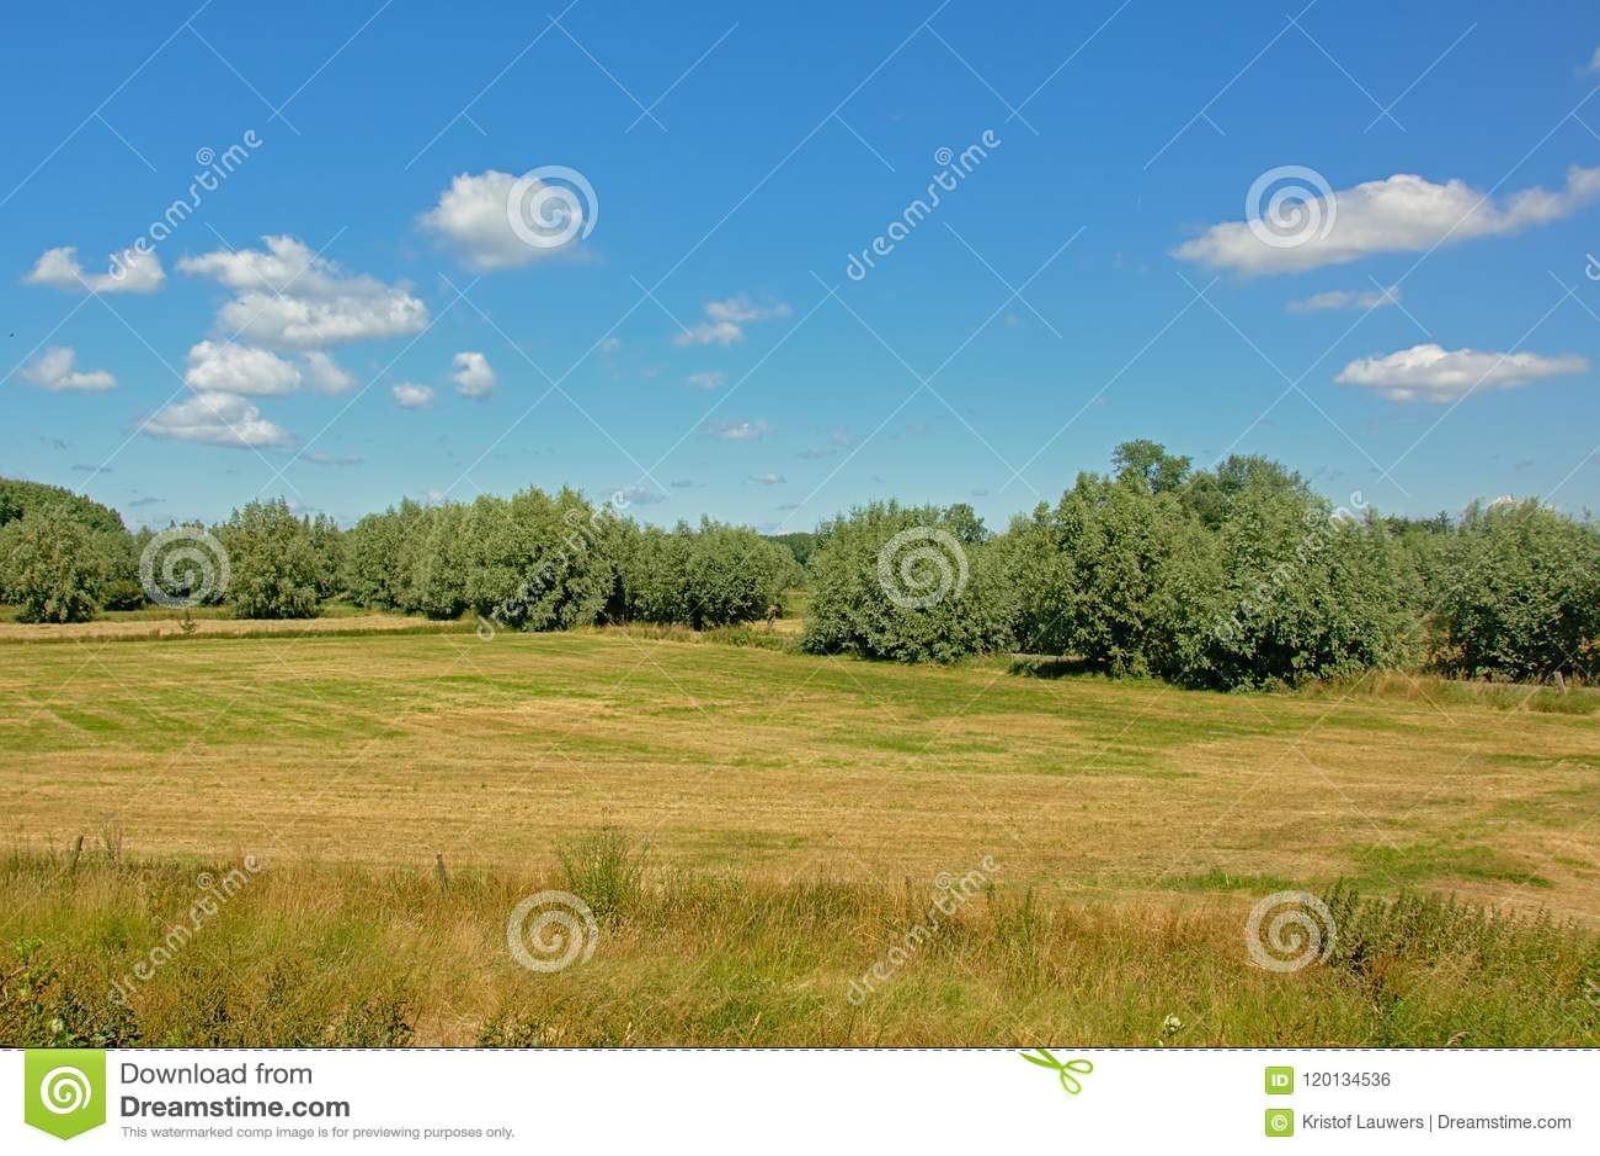 Meadow with trees under a clear blue sky in Kalkense Meersen nature reserve, Flanders, Belgium.